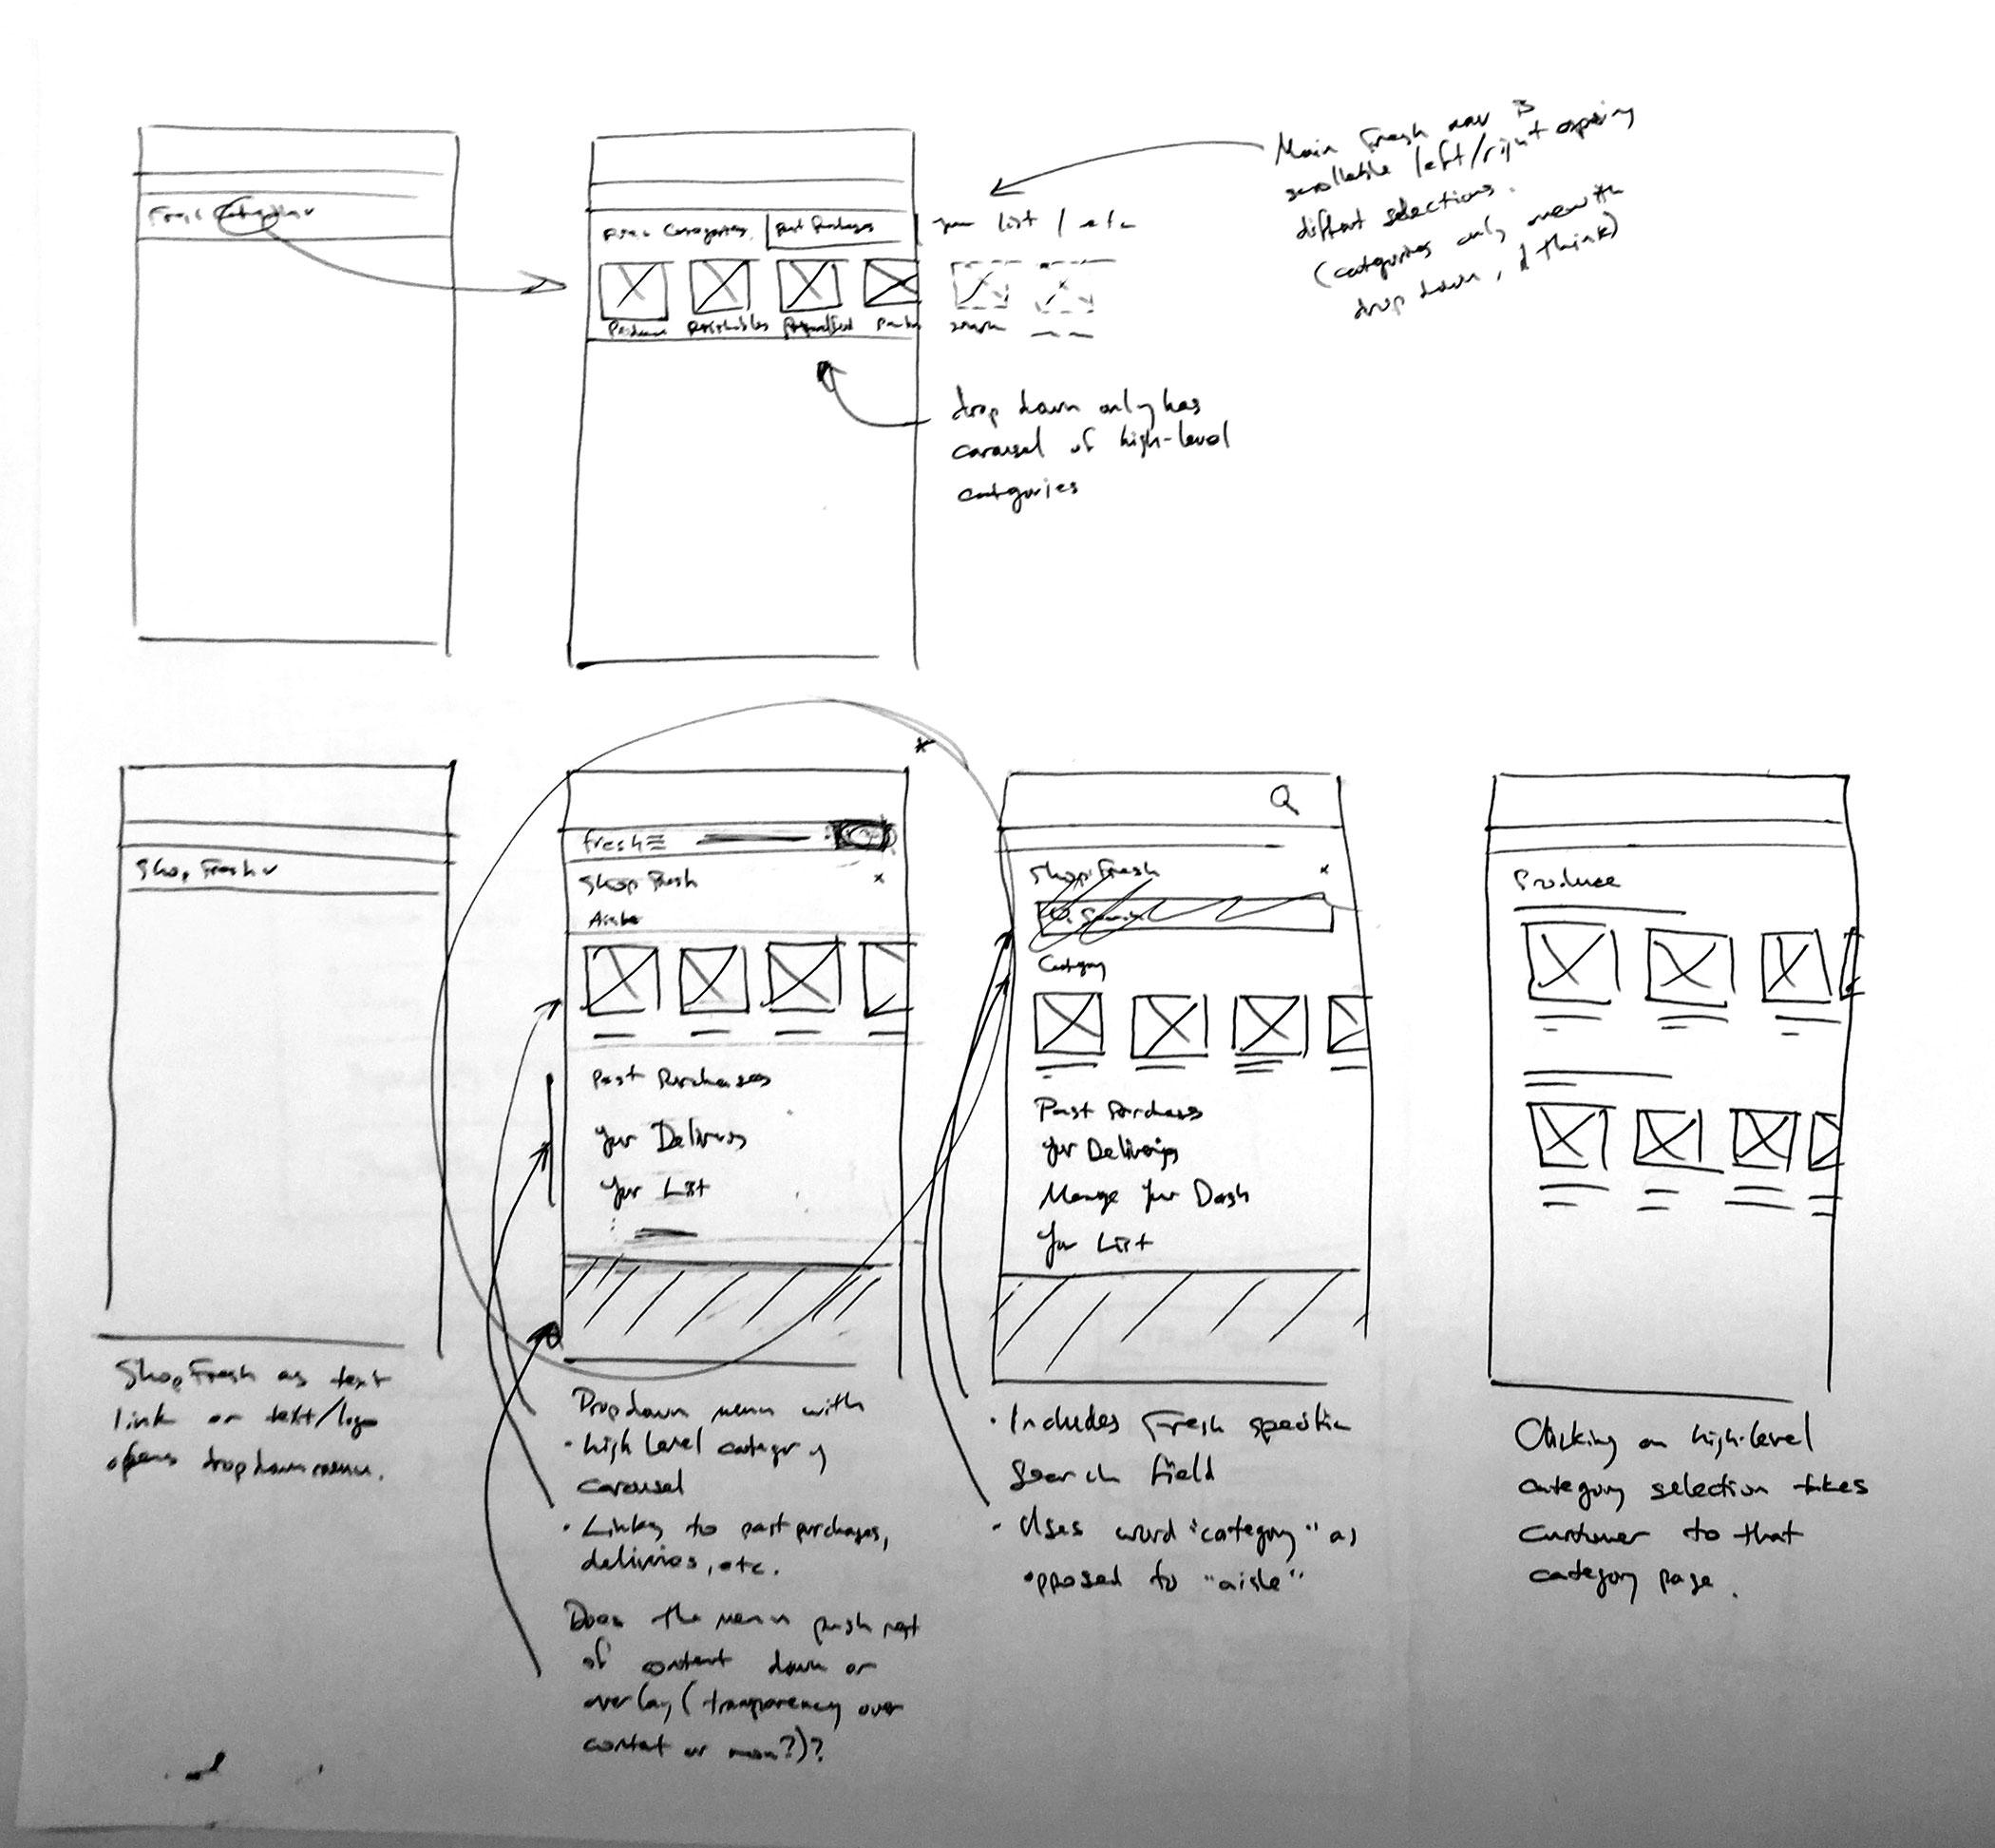 mobile_sub-nav_ideas_1.jpg